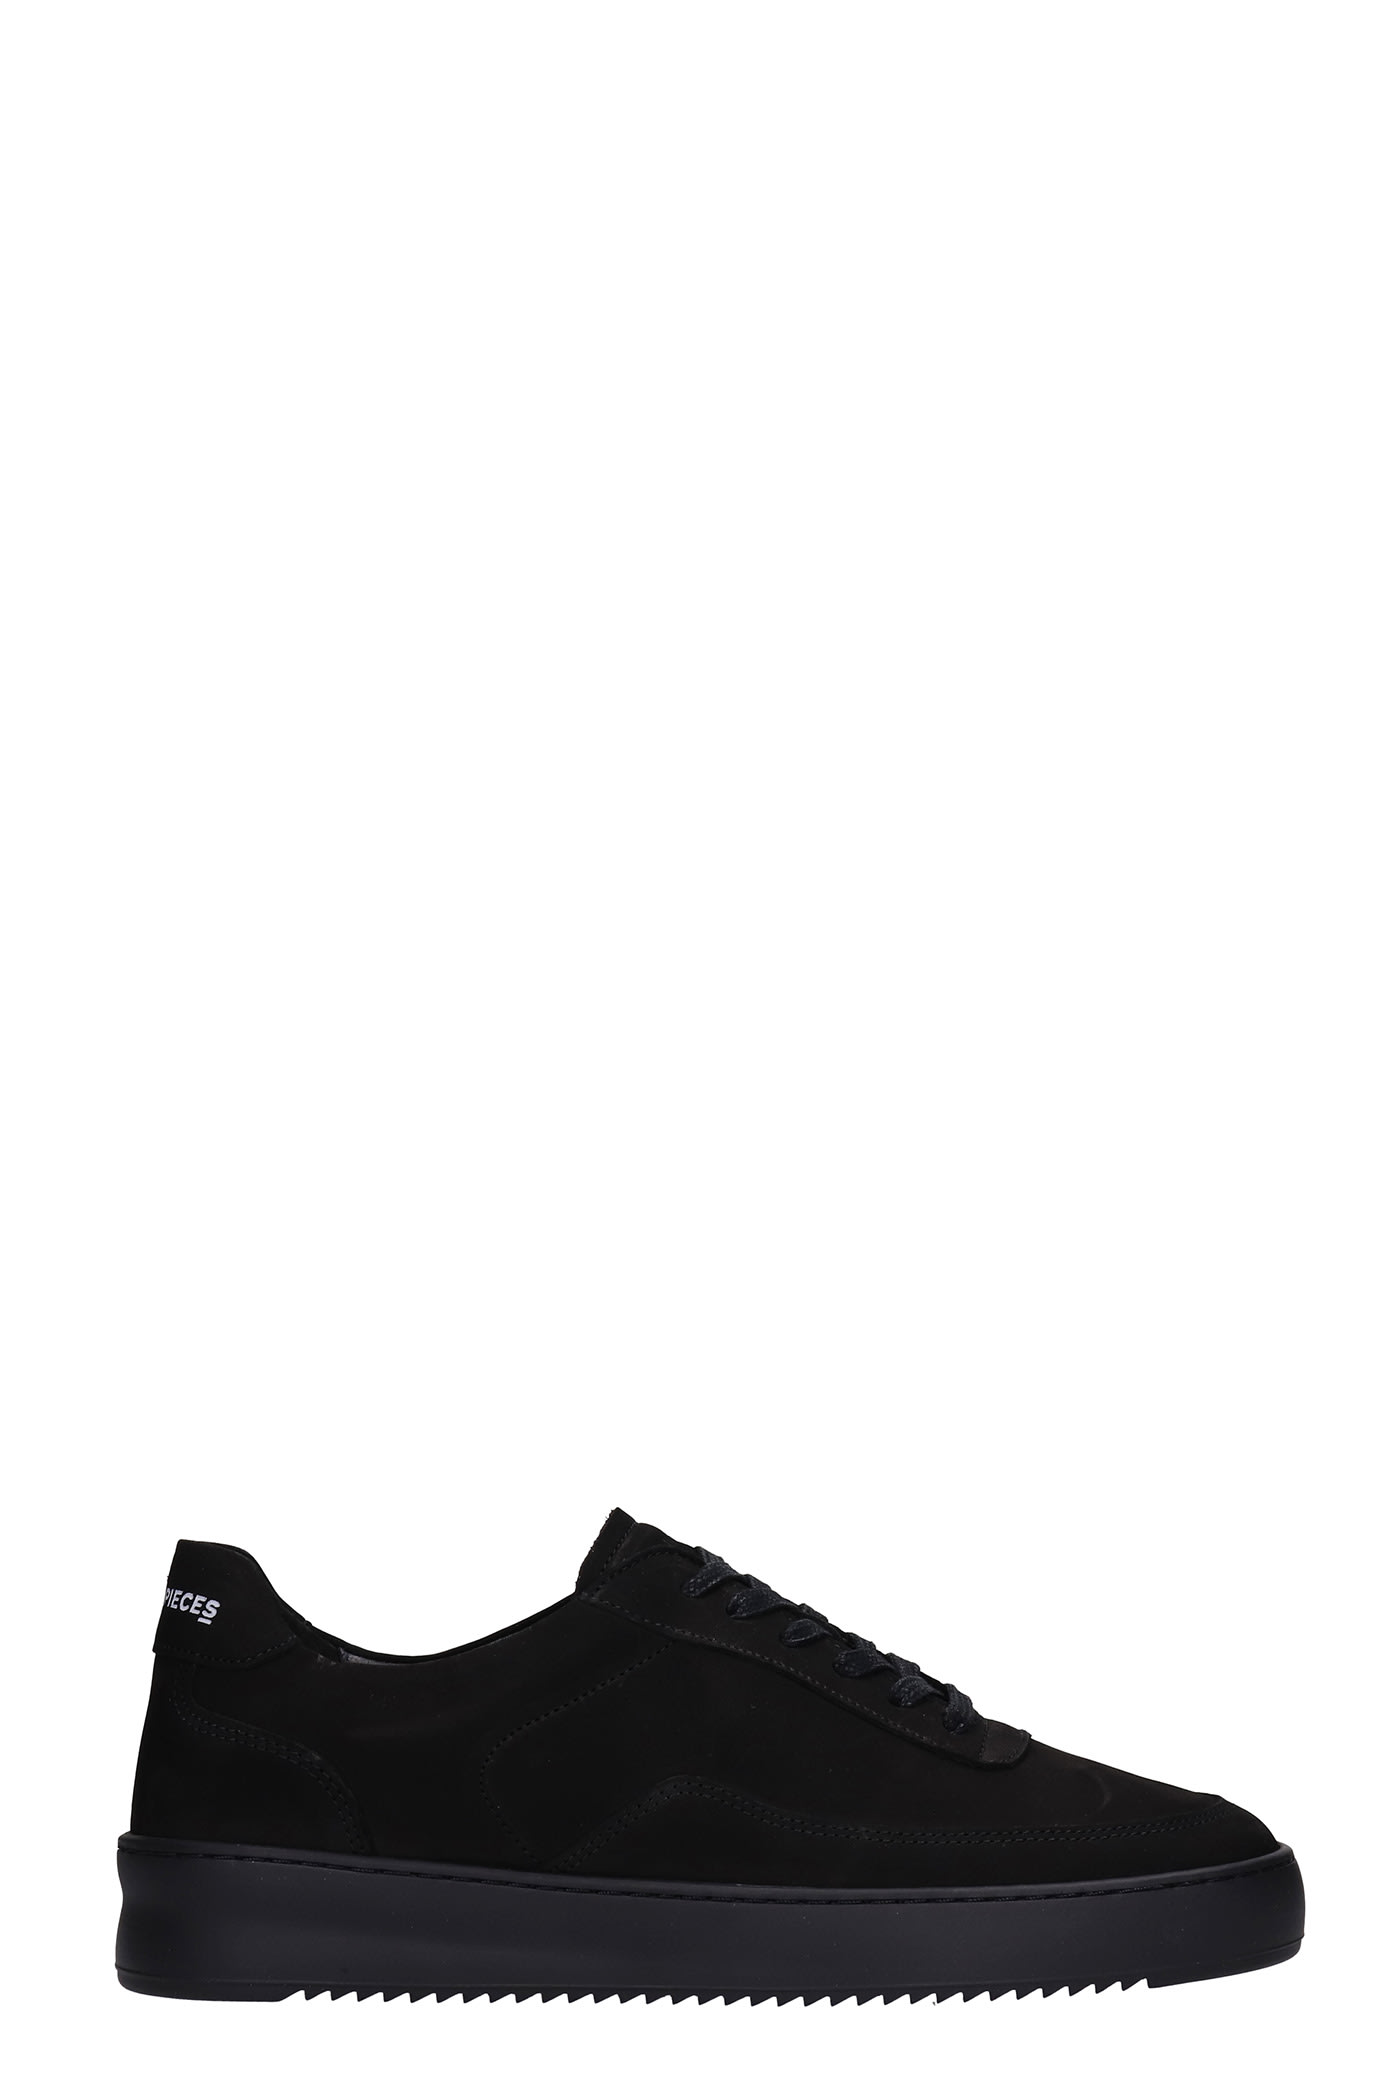 Mondo 2.0 Rippl Sneakers In Black Nubuck